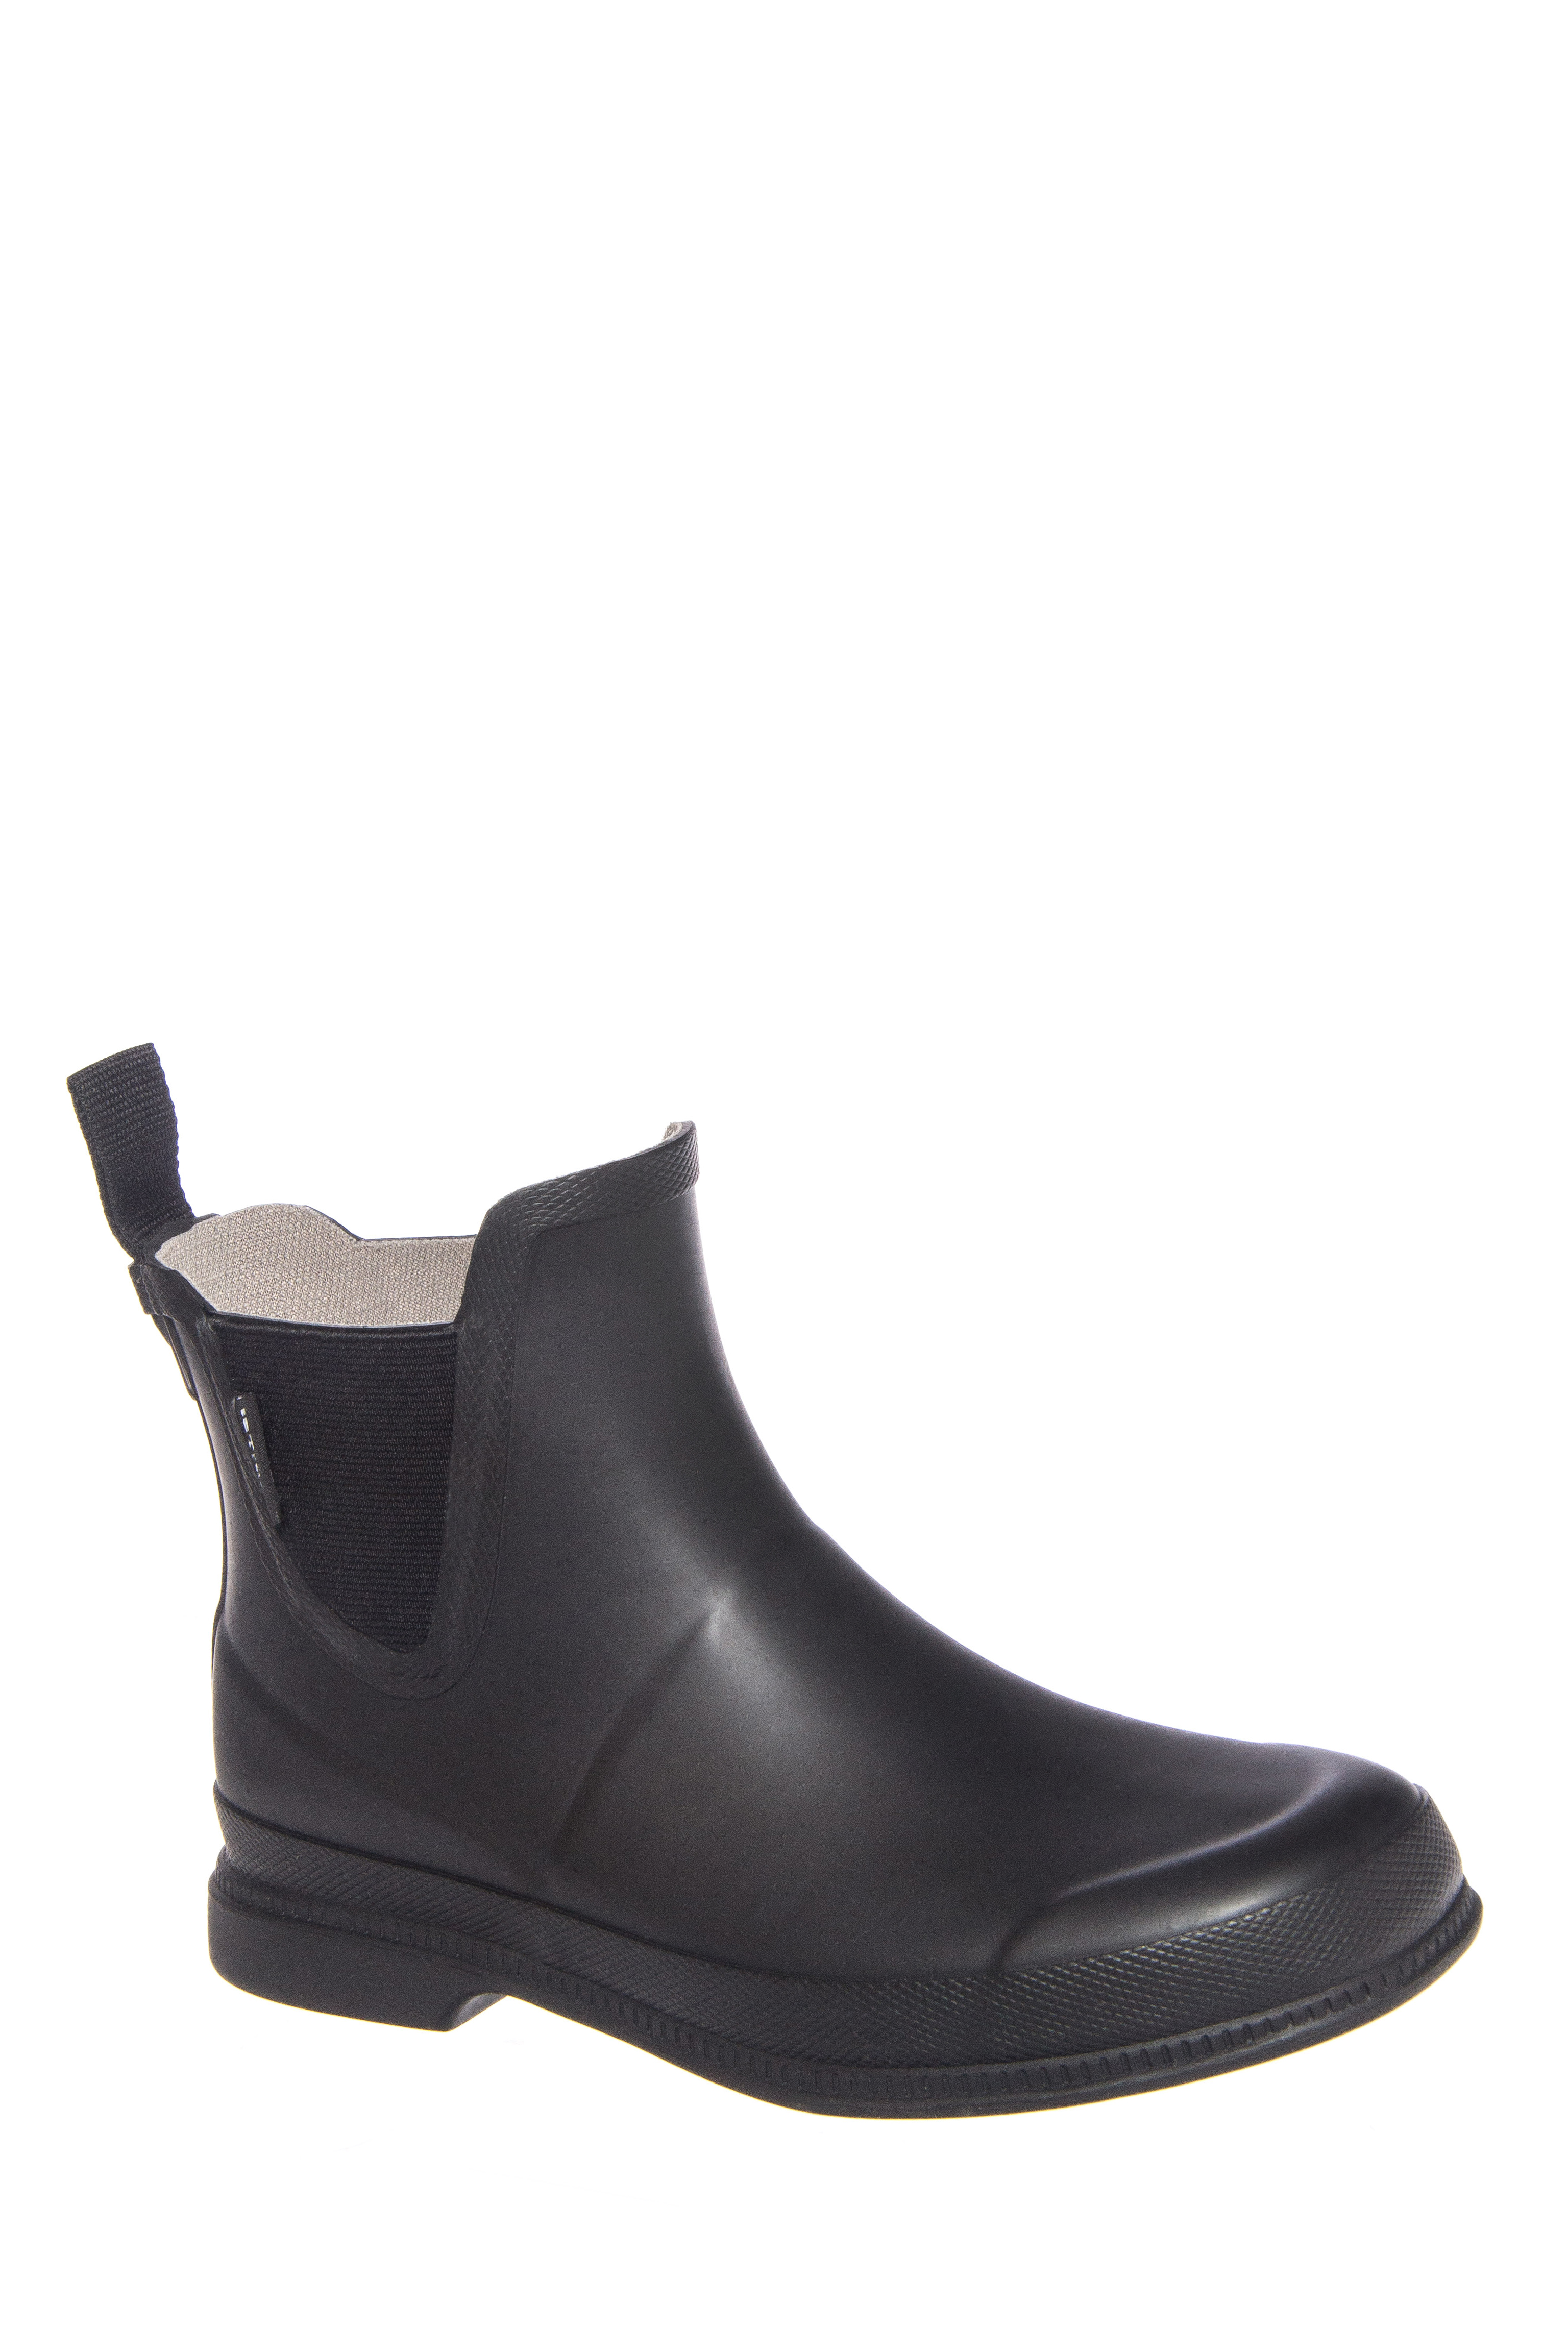 Tretorn Eva Classic Low Heel Rain Boots - Black